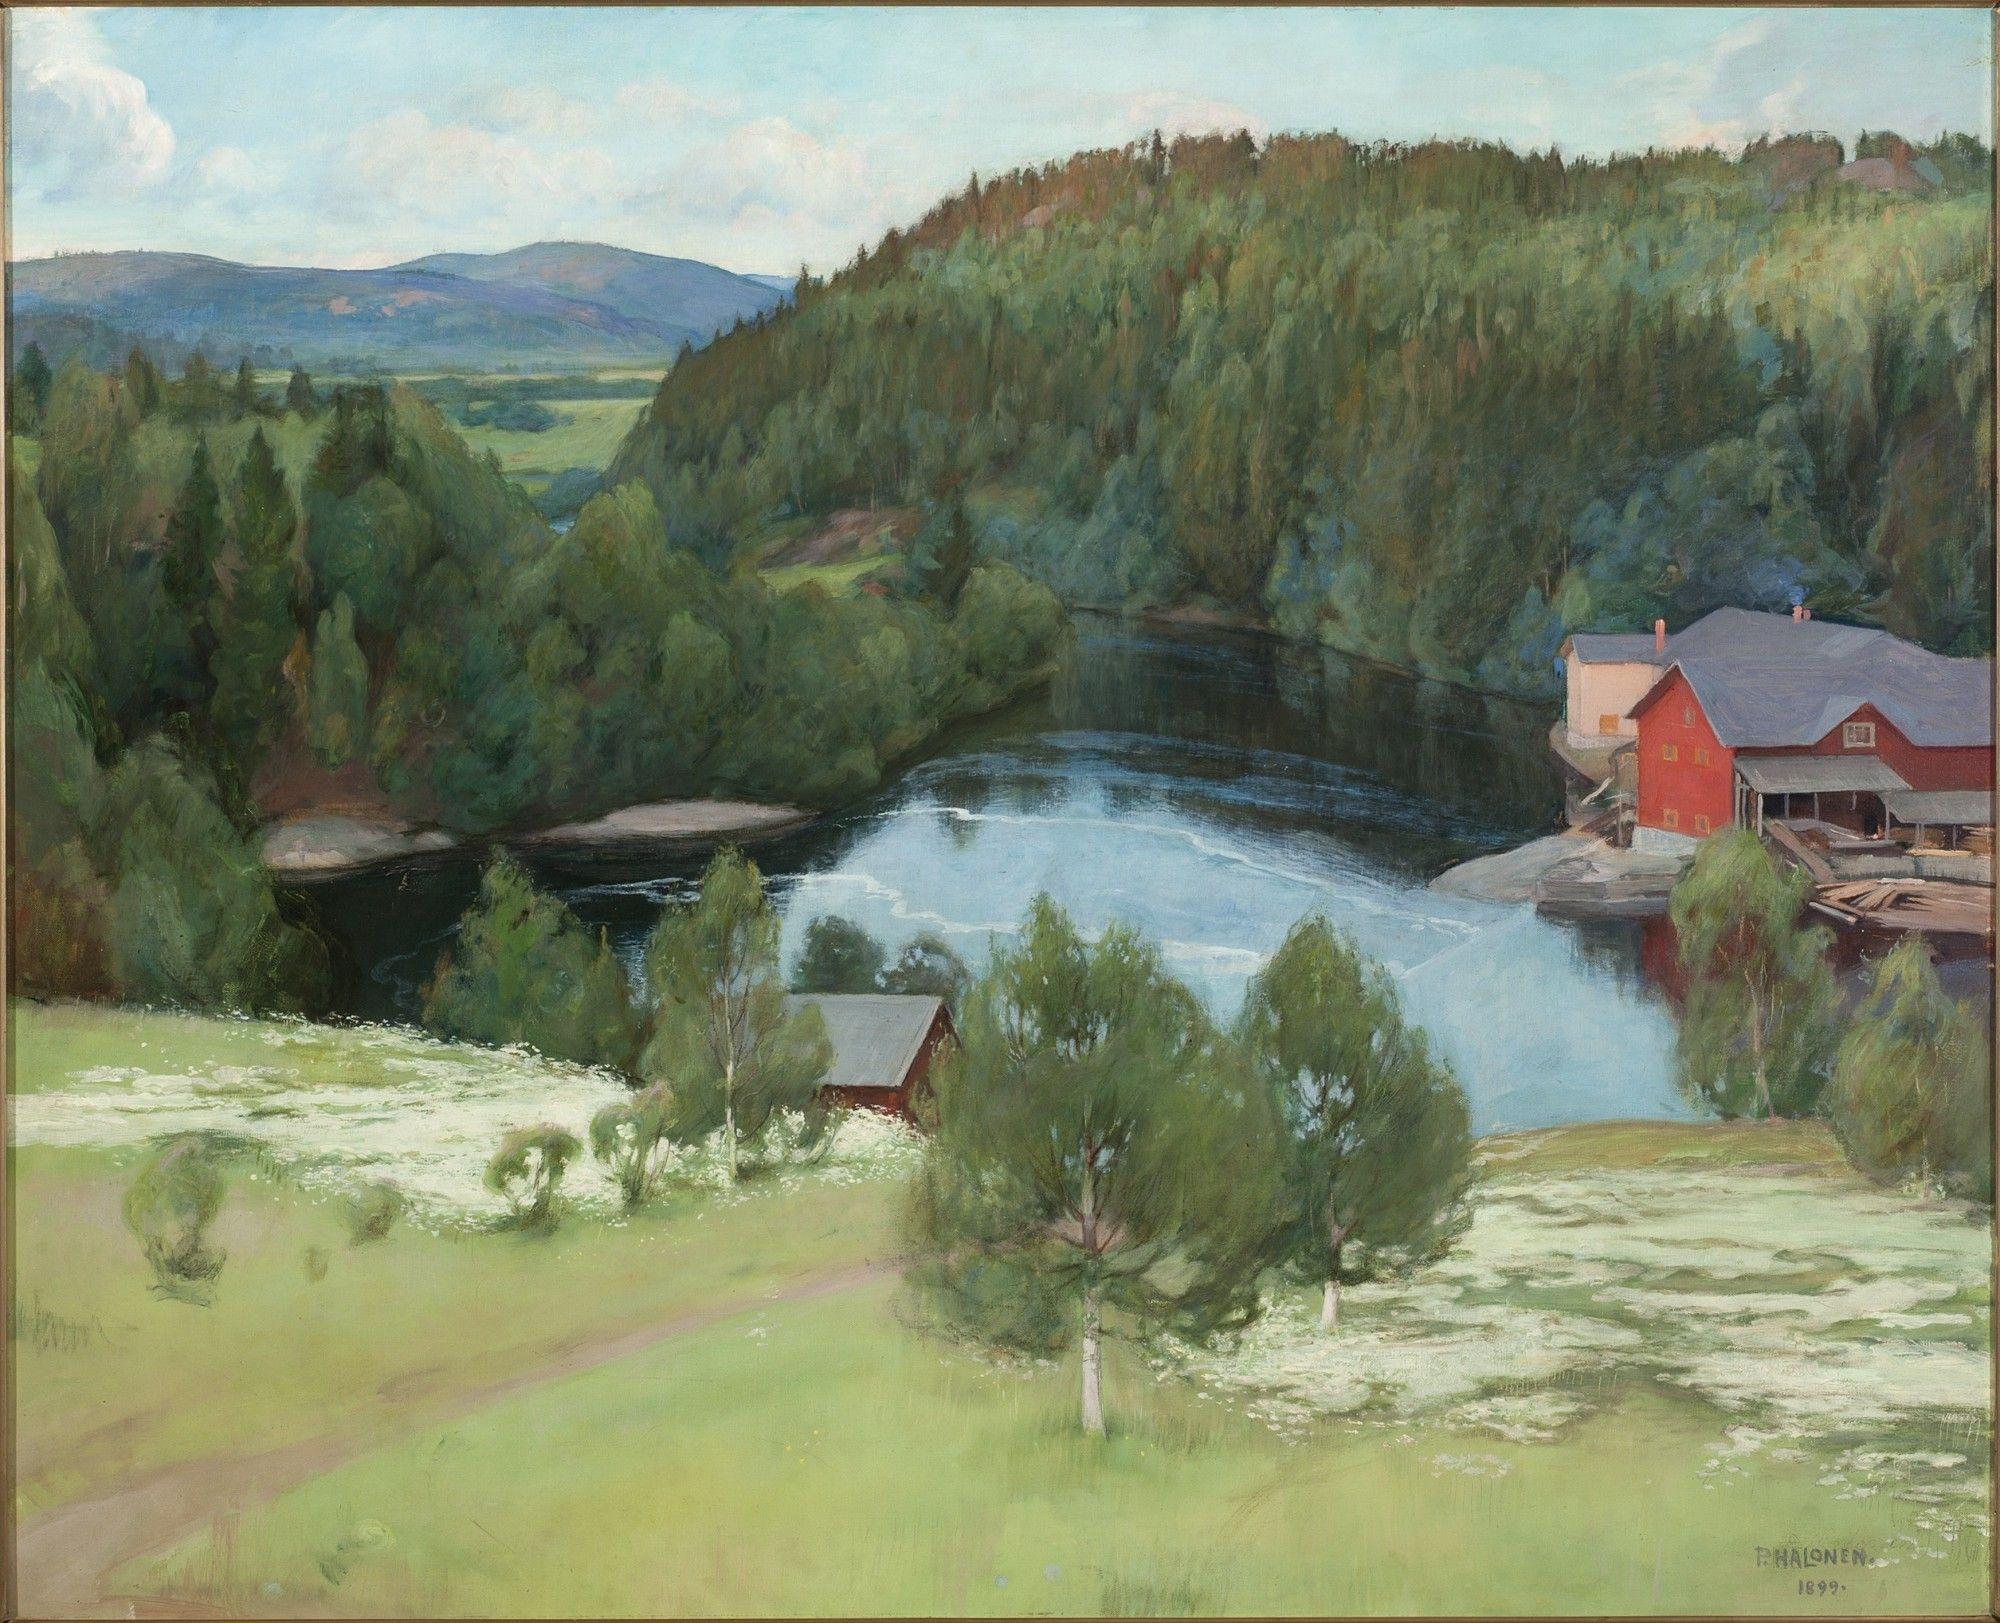 Myllykylän saha, 1899